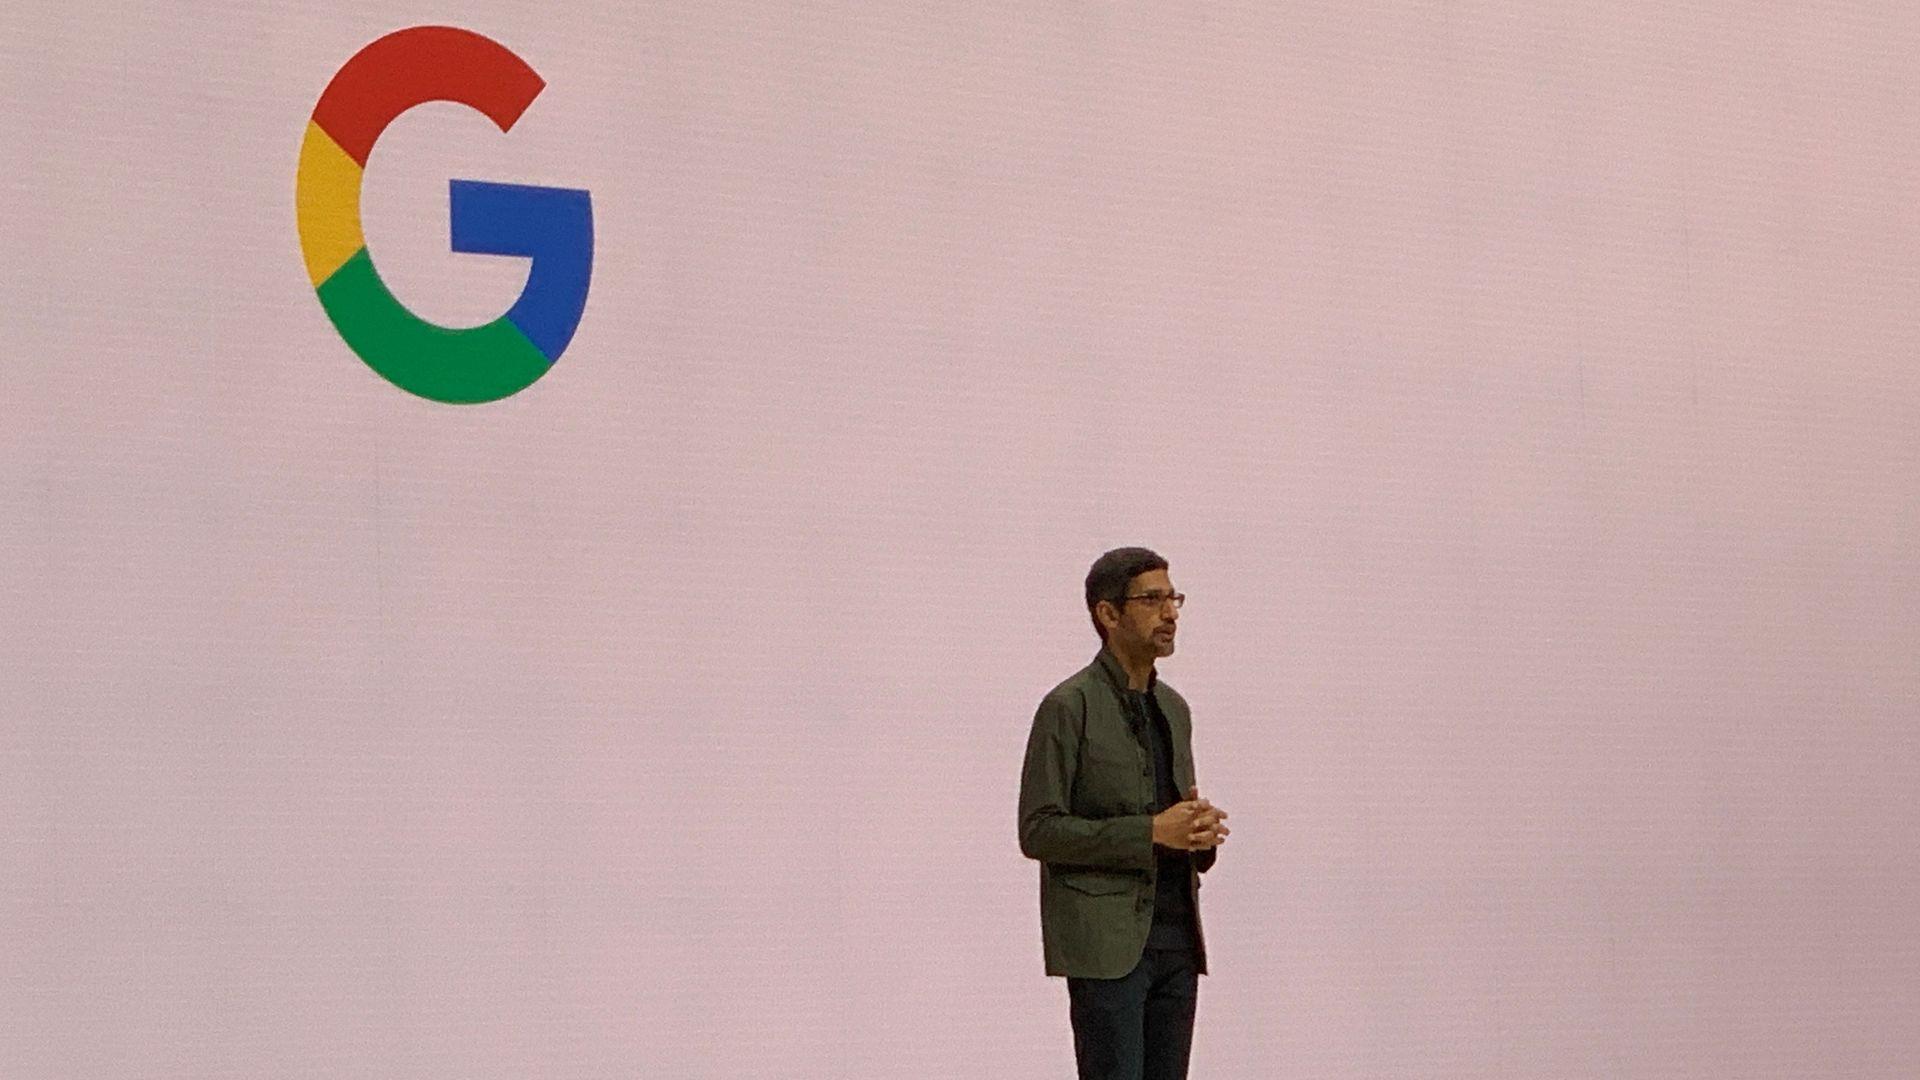 Google CEO Sundar Pichai, speaking at GDC 2019.